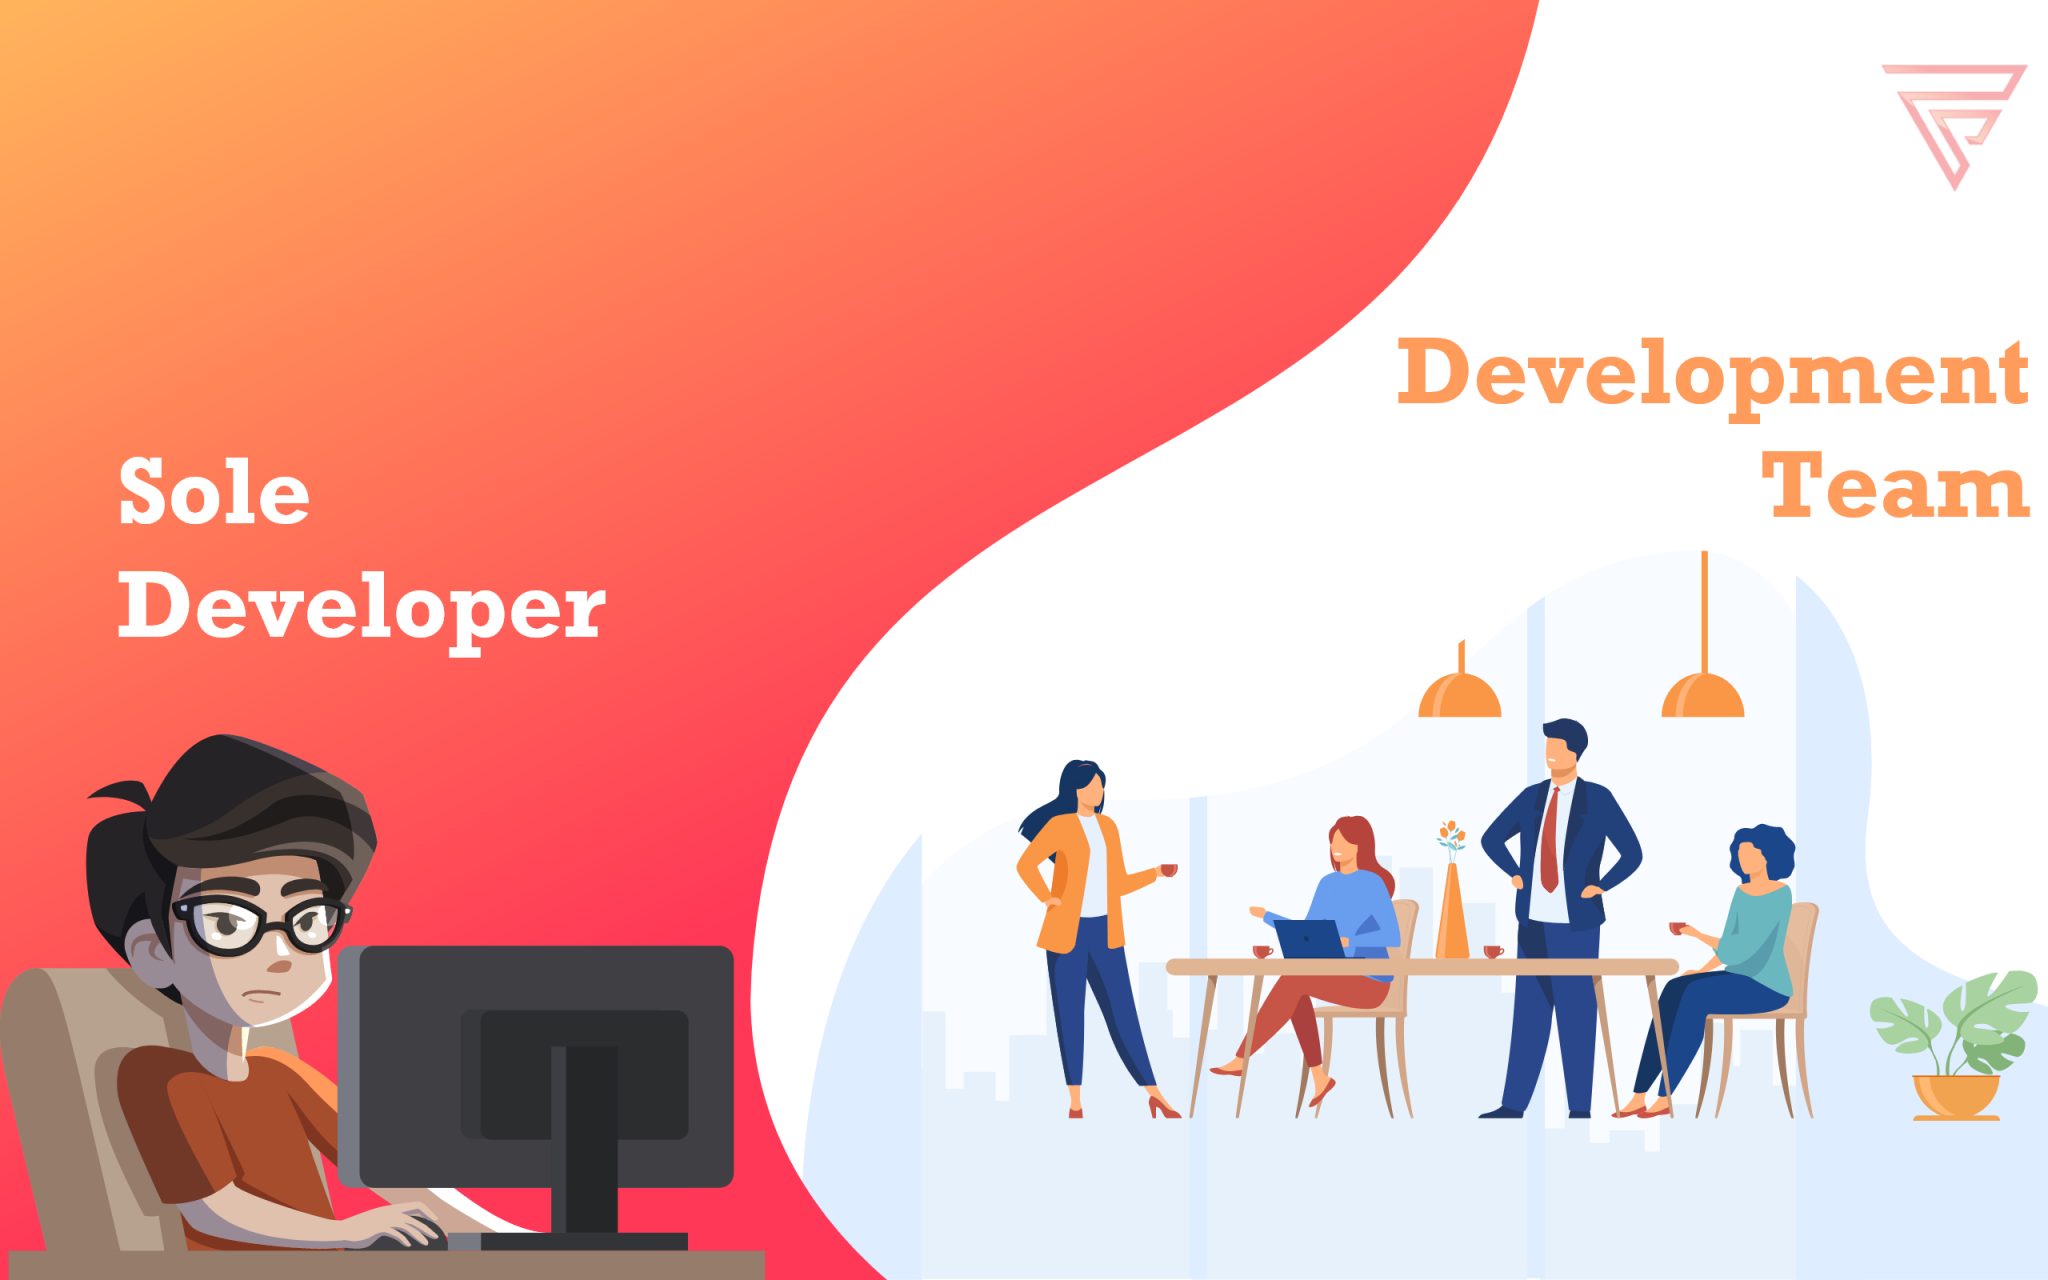 Solo Developer vs Development Team